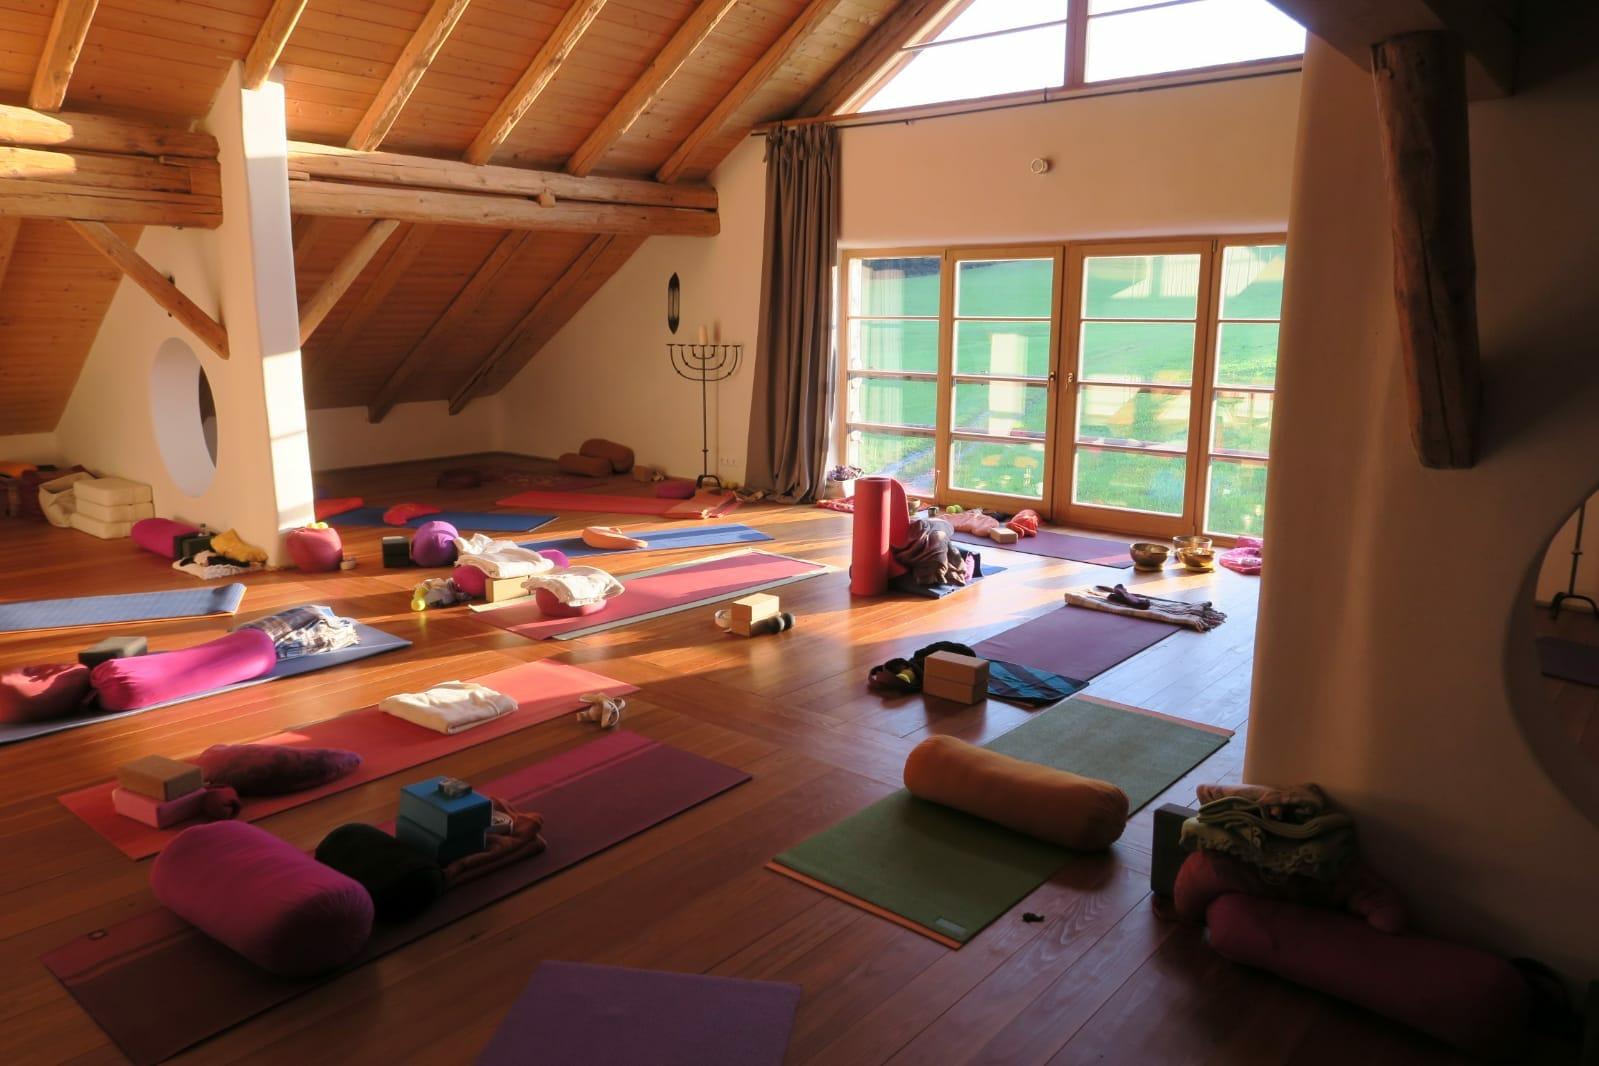 Yoga -und Ayurveda Reise im Allgäu mit Anahata Herz-Yoga